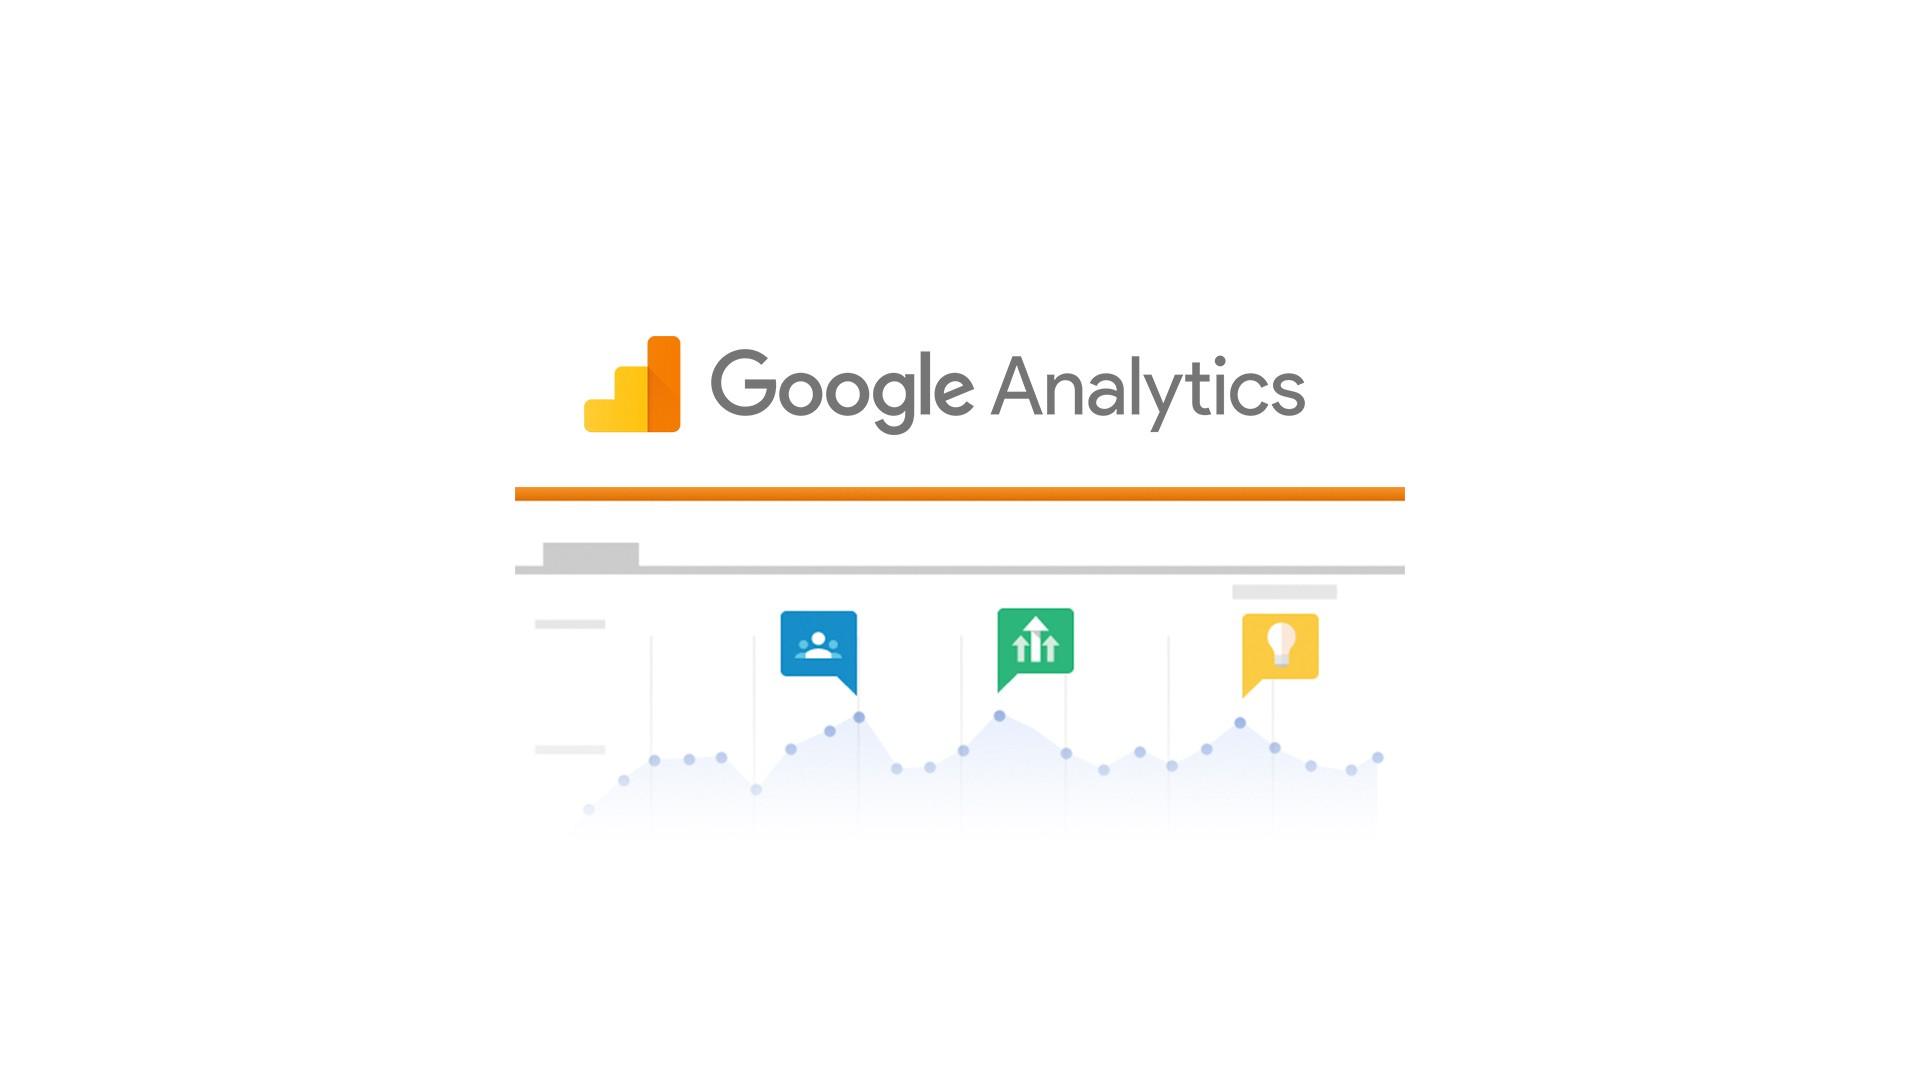 datlas_mx_blog_google_analytics_logo